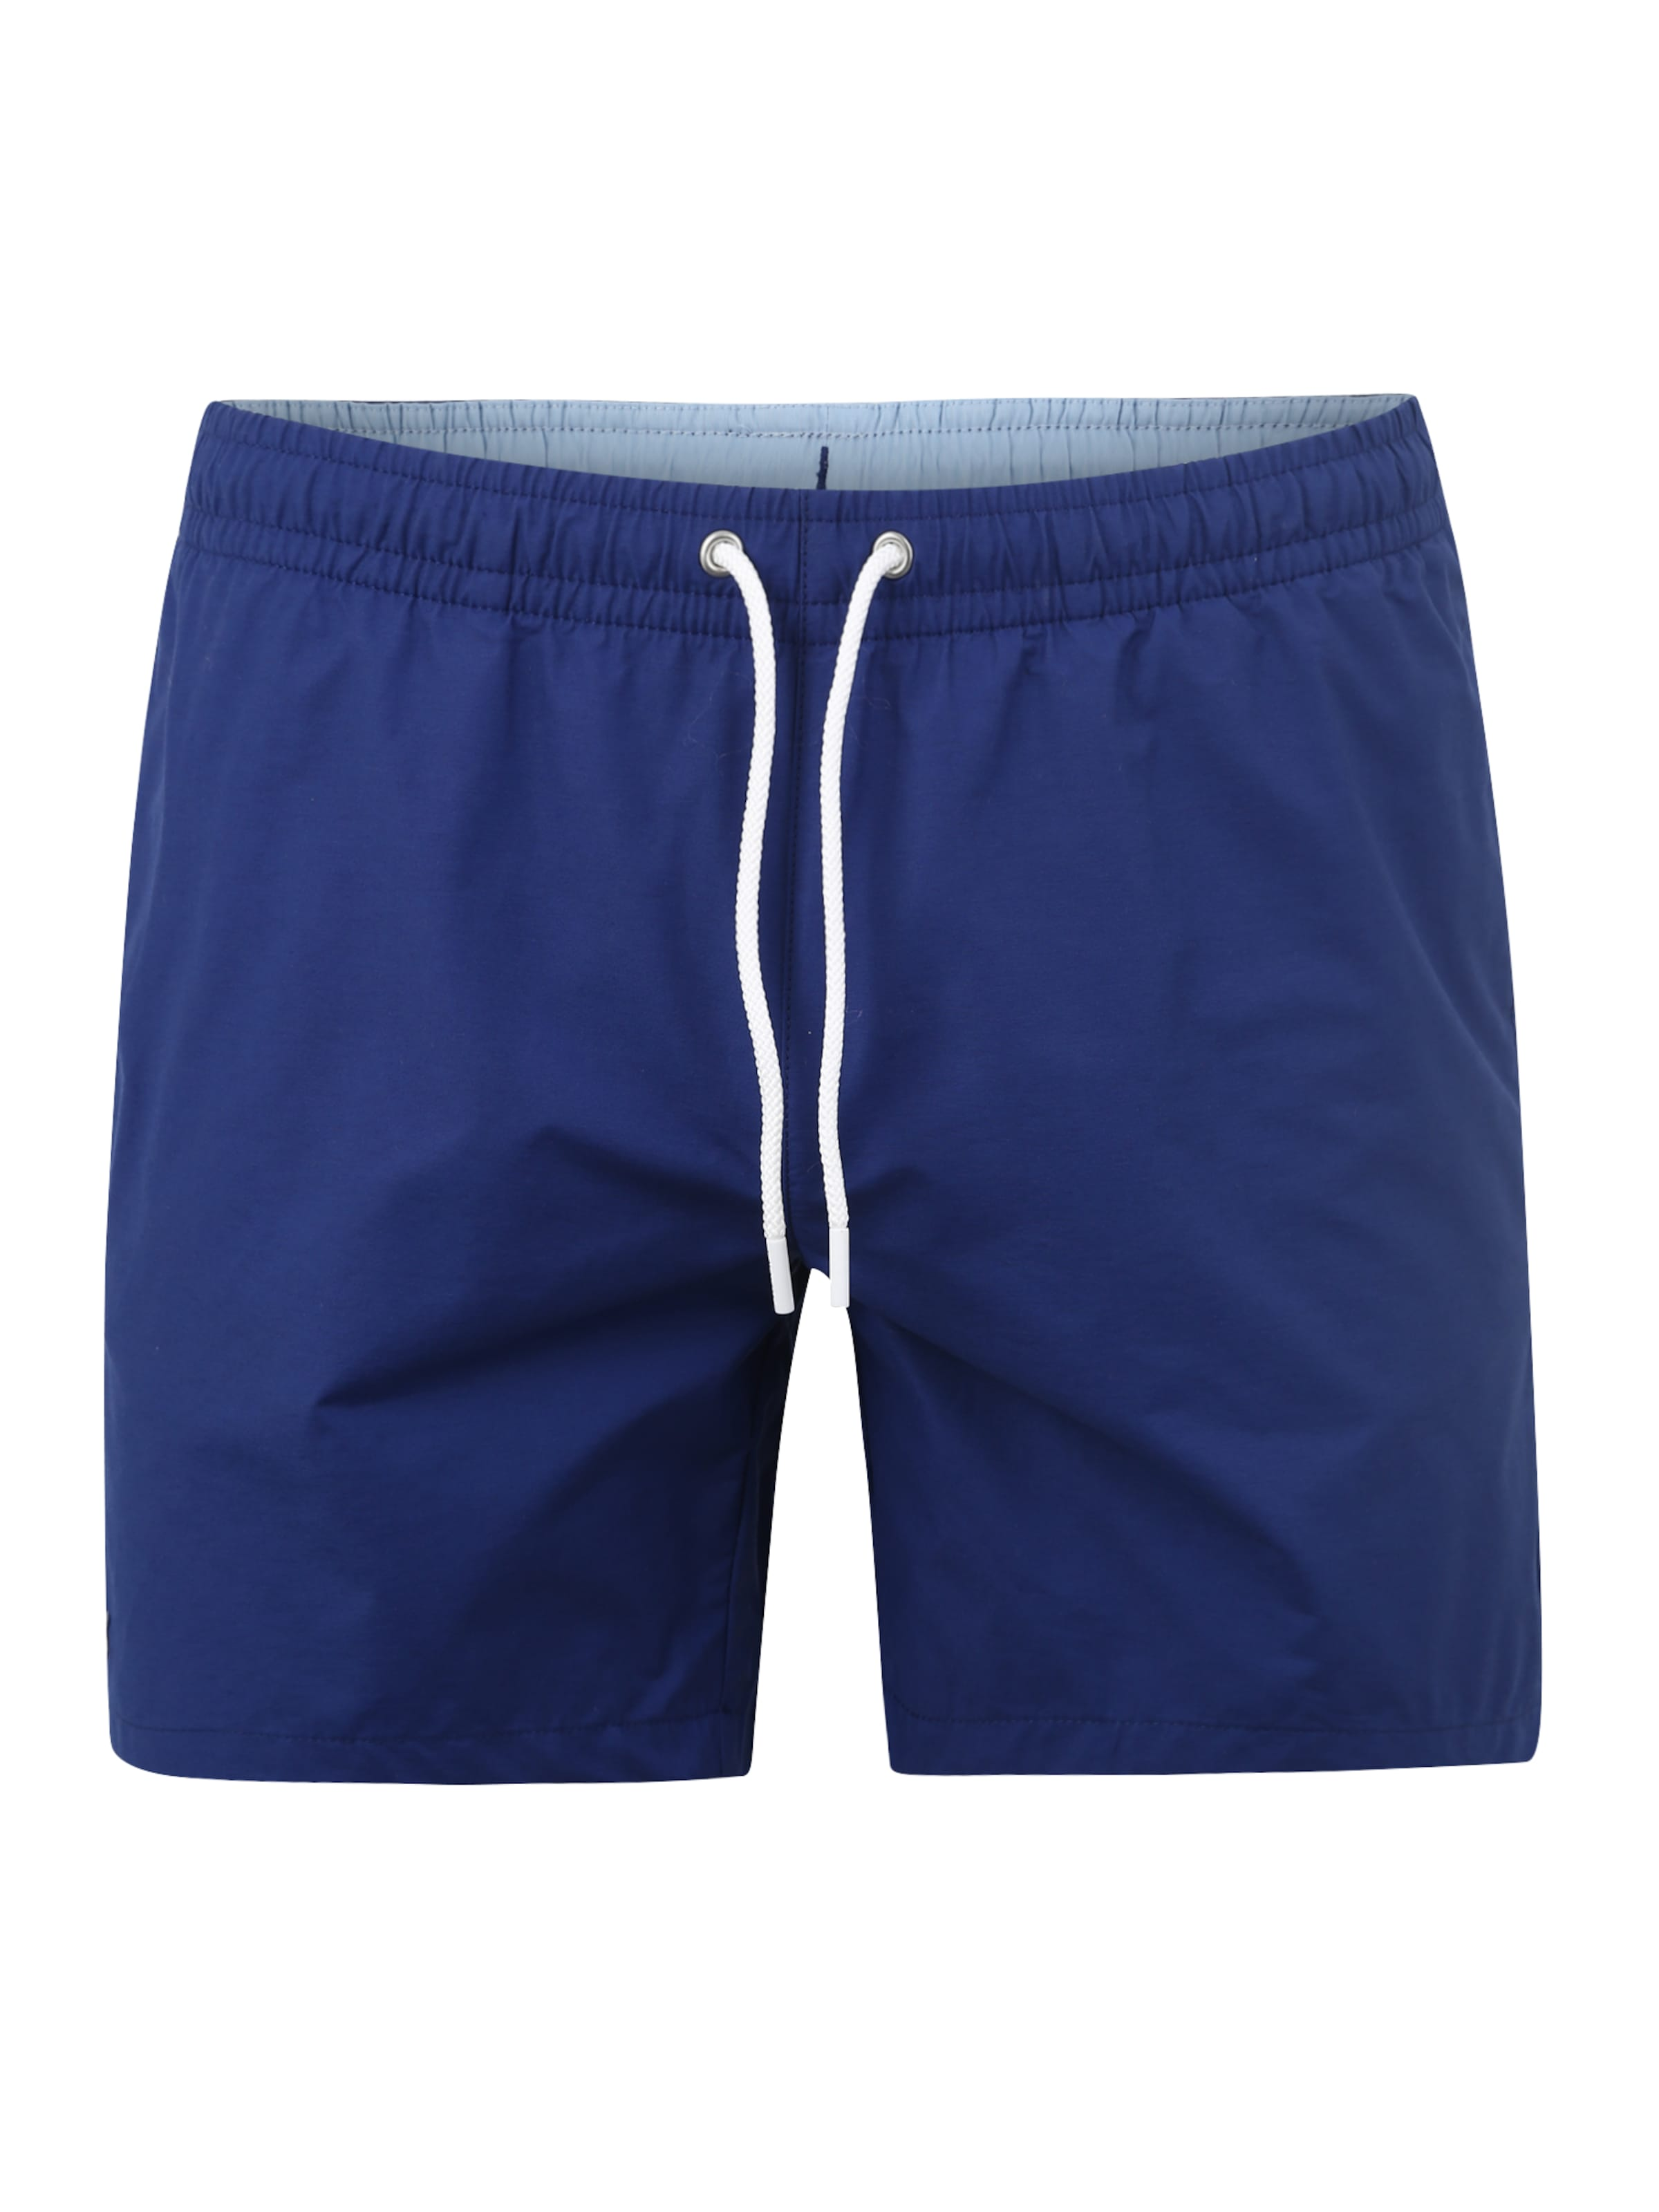 Shorts Bleu Lacoste En De Bain lK13FJTc